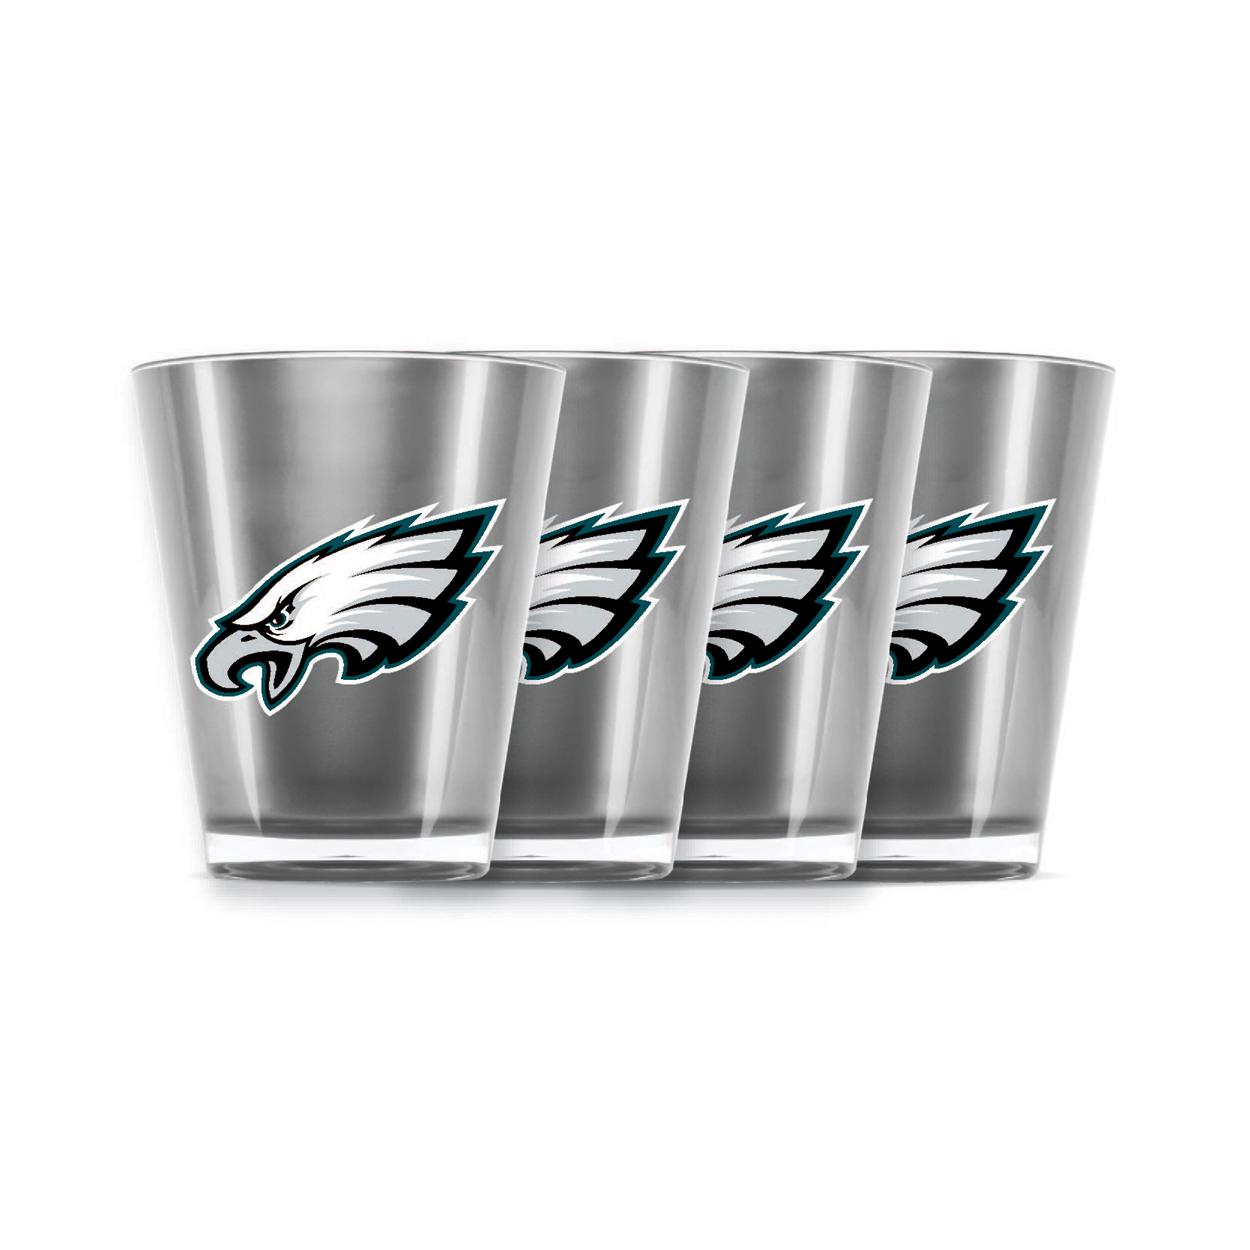 Duckhouse NFL Philadelphia Eagles 4 piece shot gla